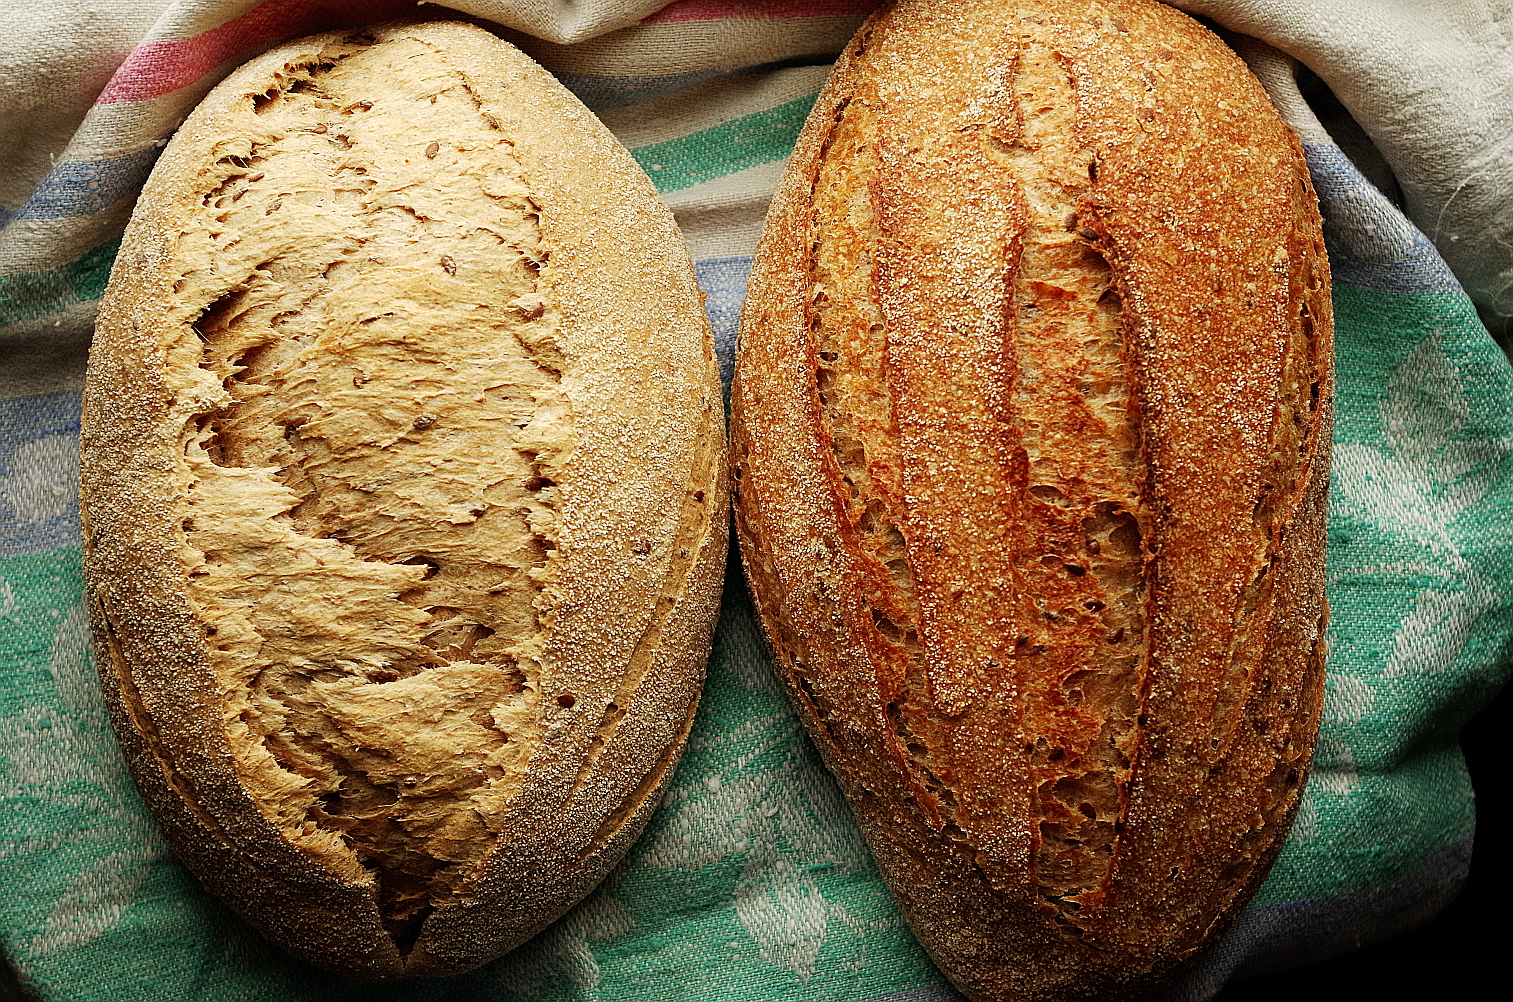 хлеб без пара и с паром